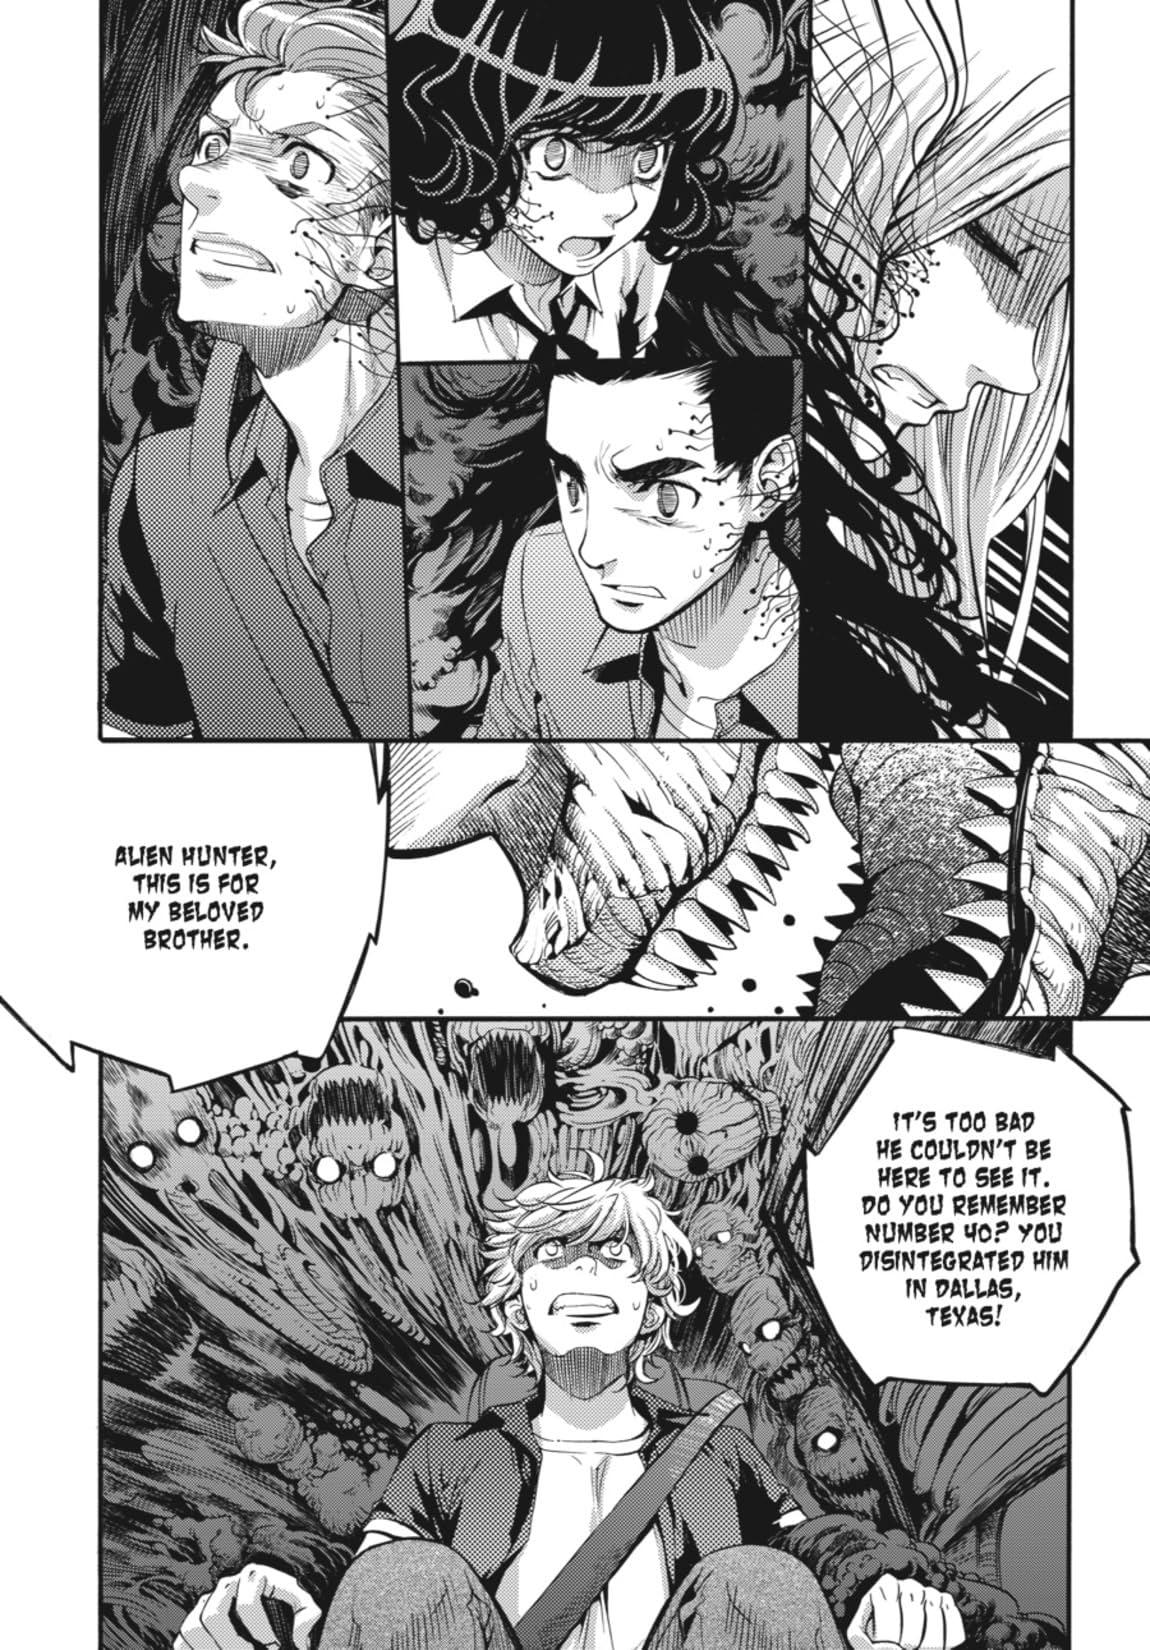 Daniel X: The Manga Vol. 3